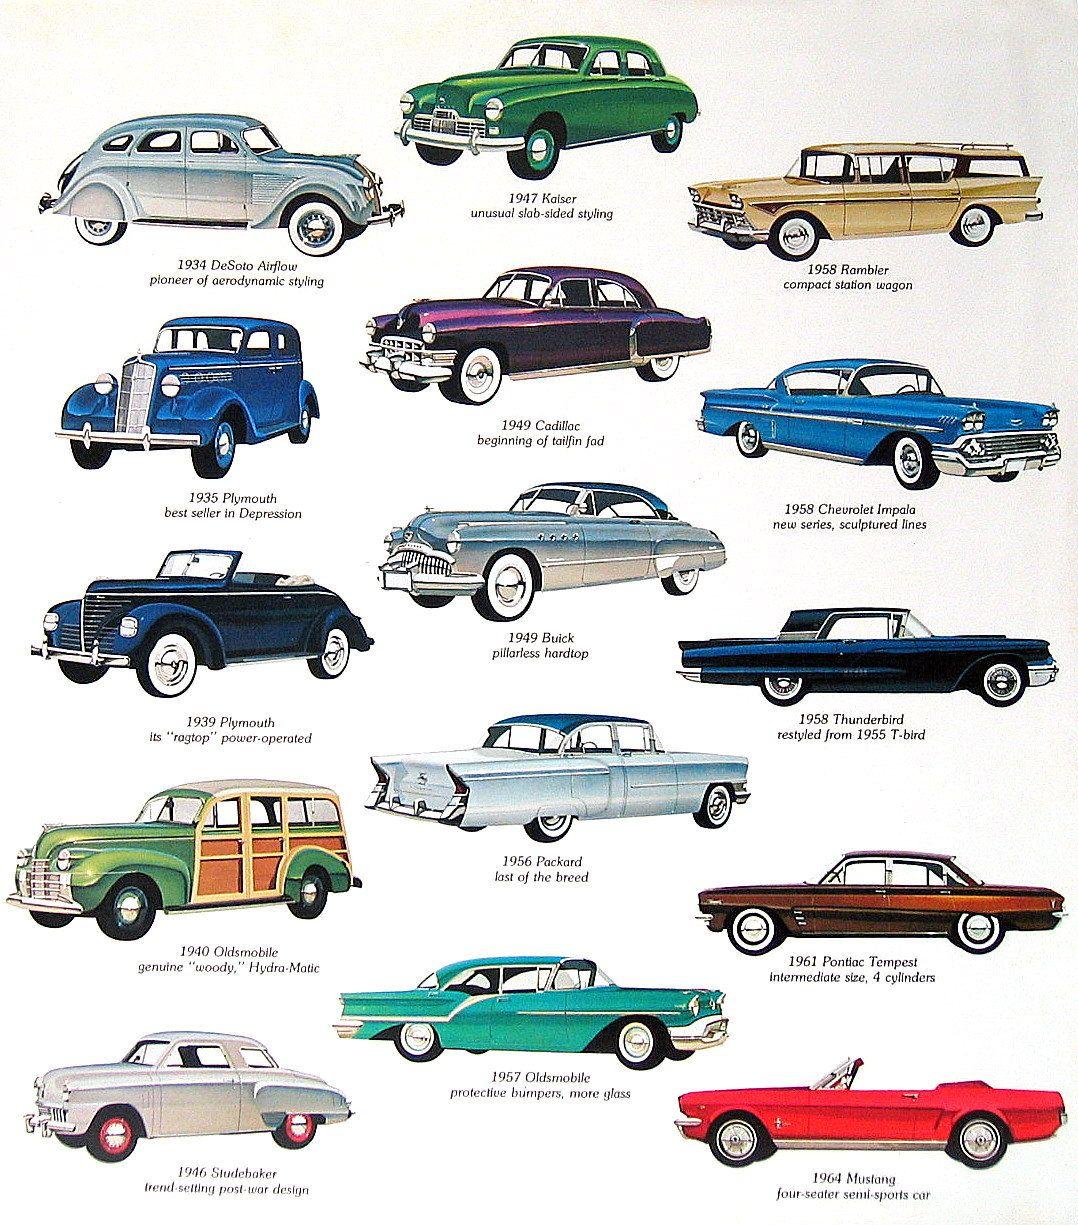 1975 Vintage Print Classic American Cars Etsy Vintage Prints Classic Cars Vintage